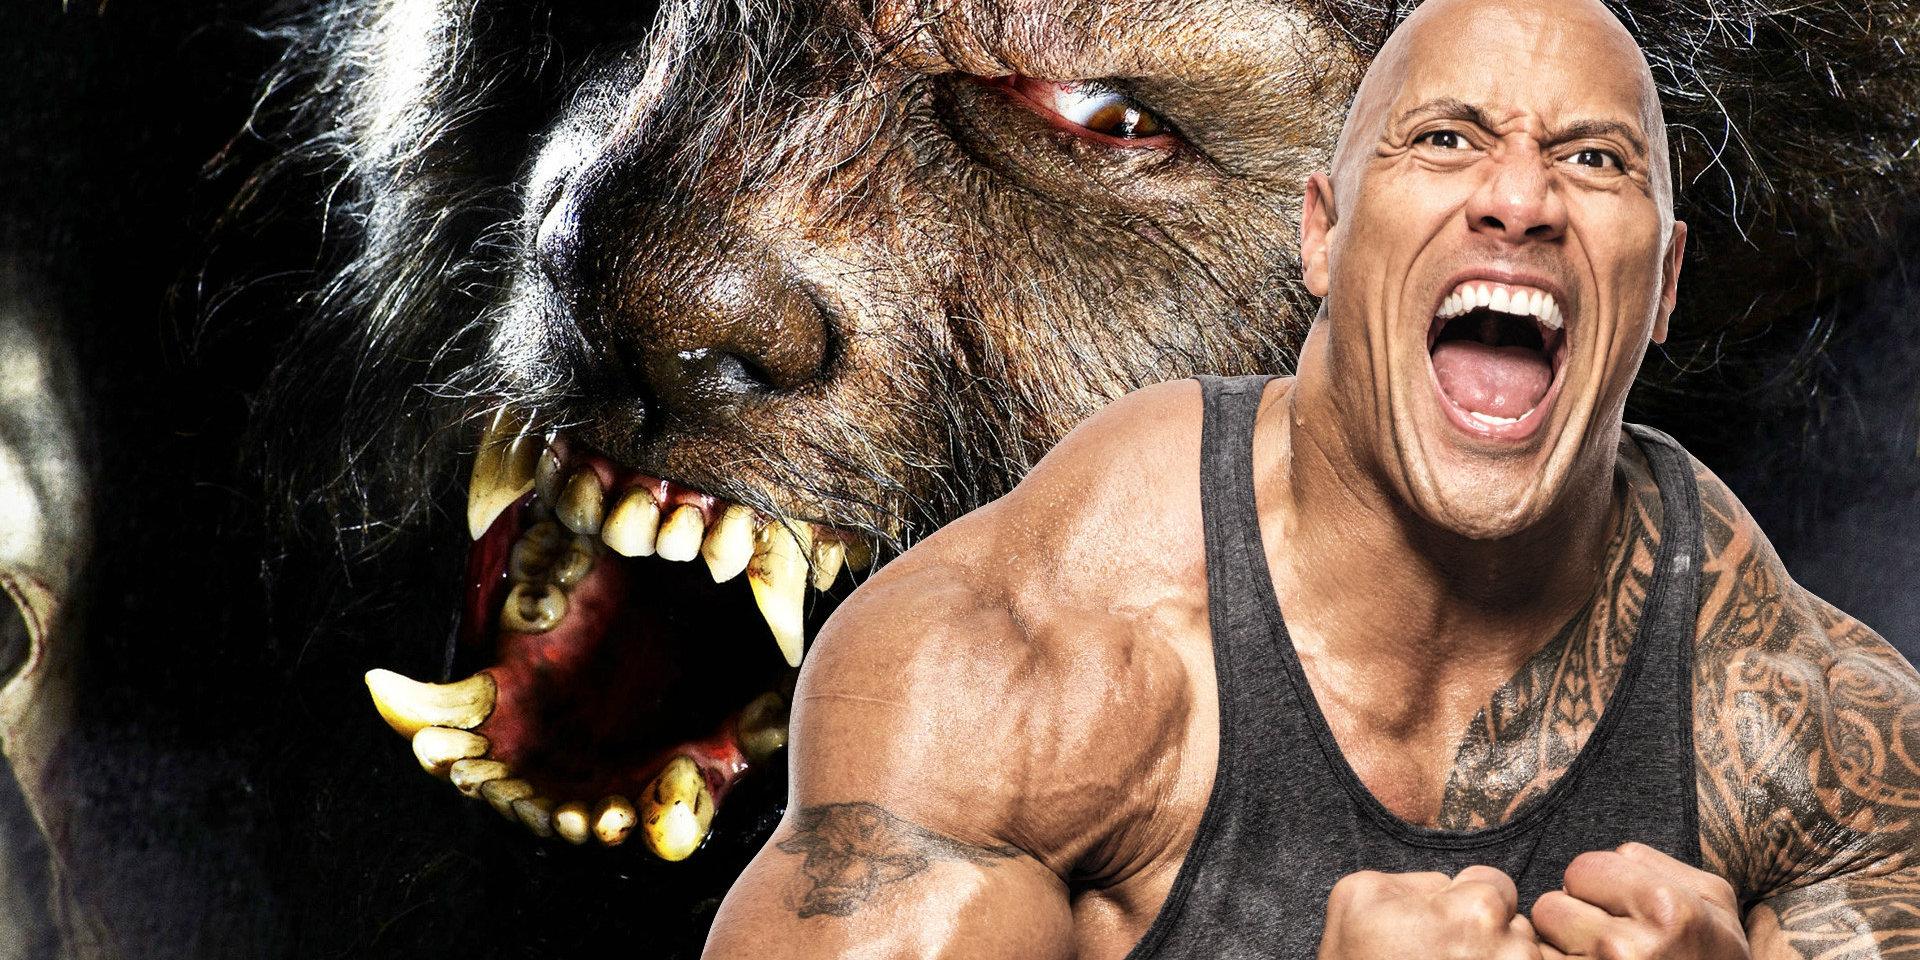 Dwayne Johnson Earmarked For The Wolfman In Dark Universe